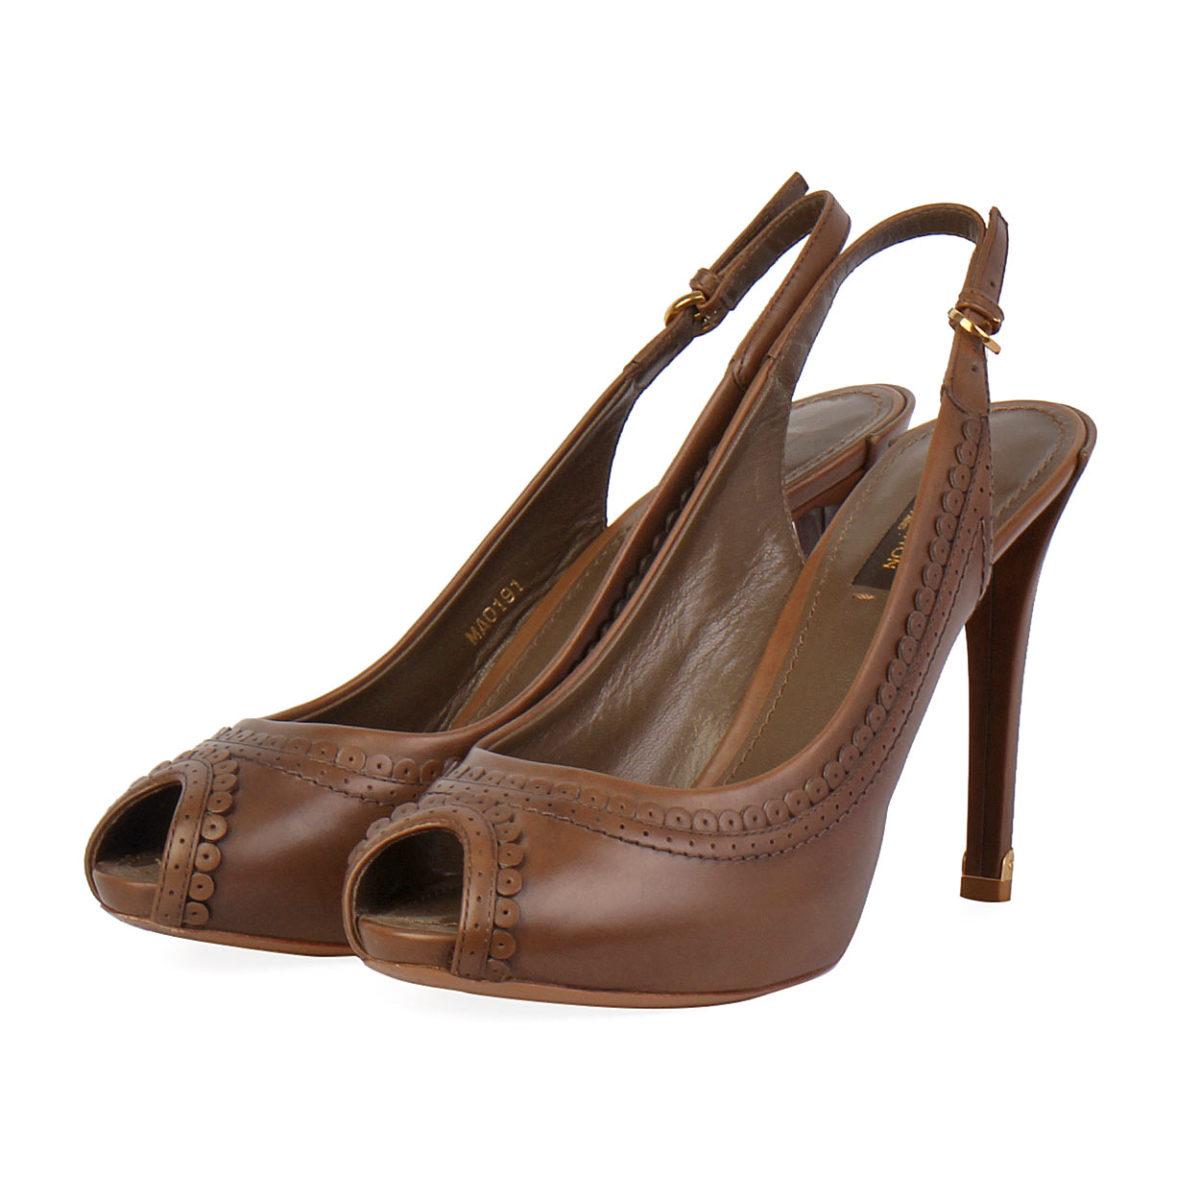 9ea48b9be9a LOUIS VUITTON Leather Peep Toe Slingback Pumps Brown - S  38 (5 ...